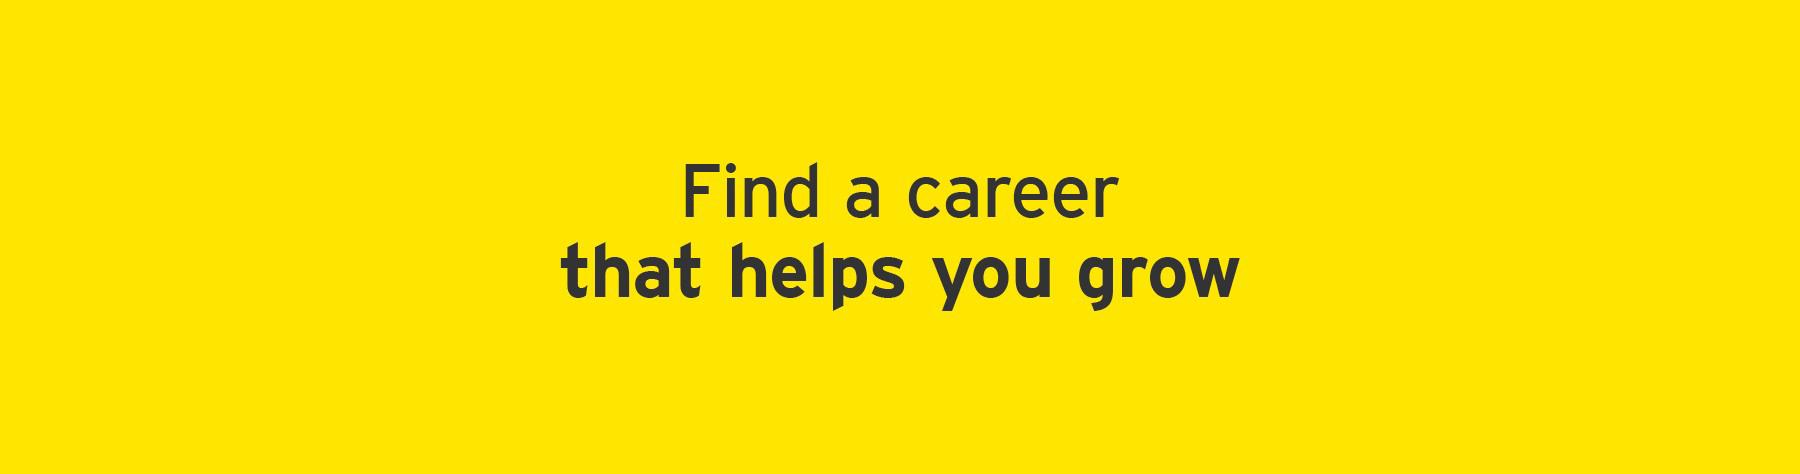 EY find a career